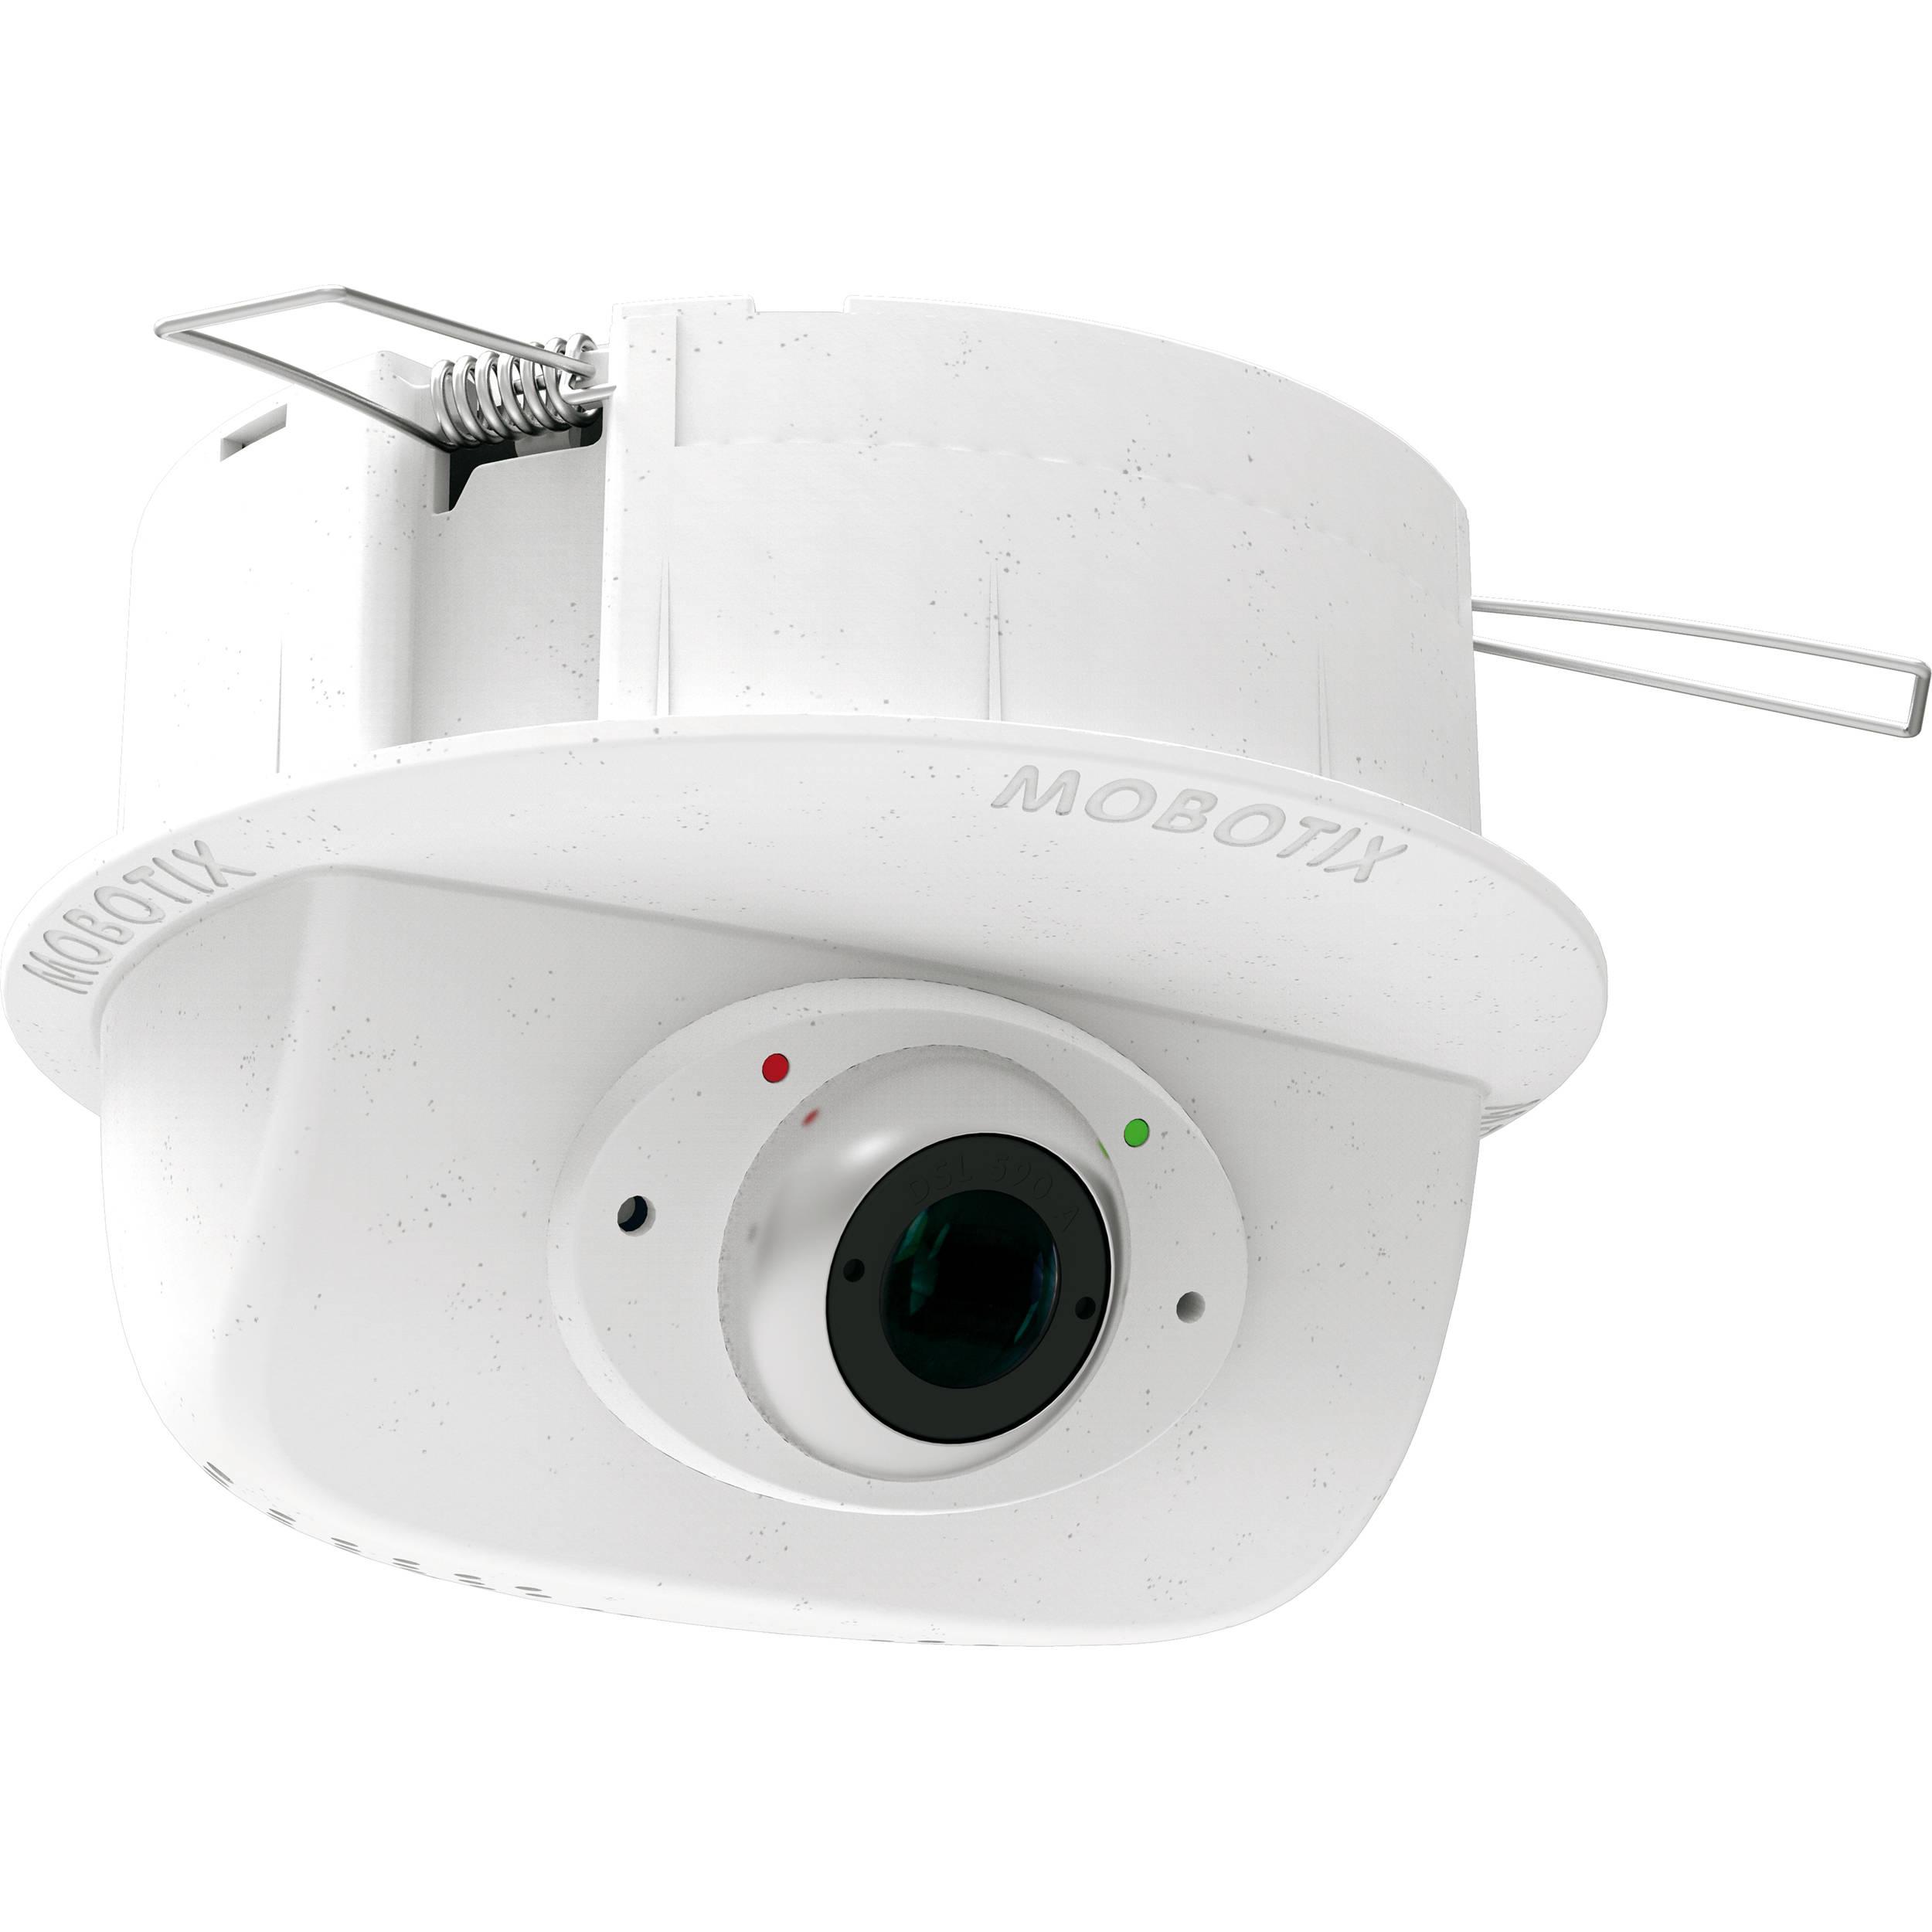 MOBOTIX p26 6MP Network Camera with B016 Day Sensor Module